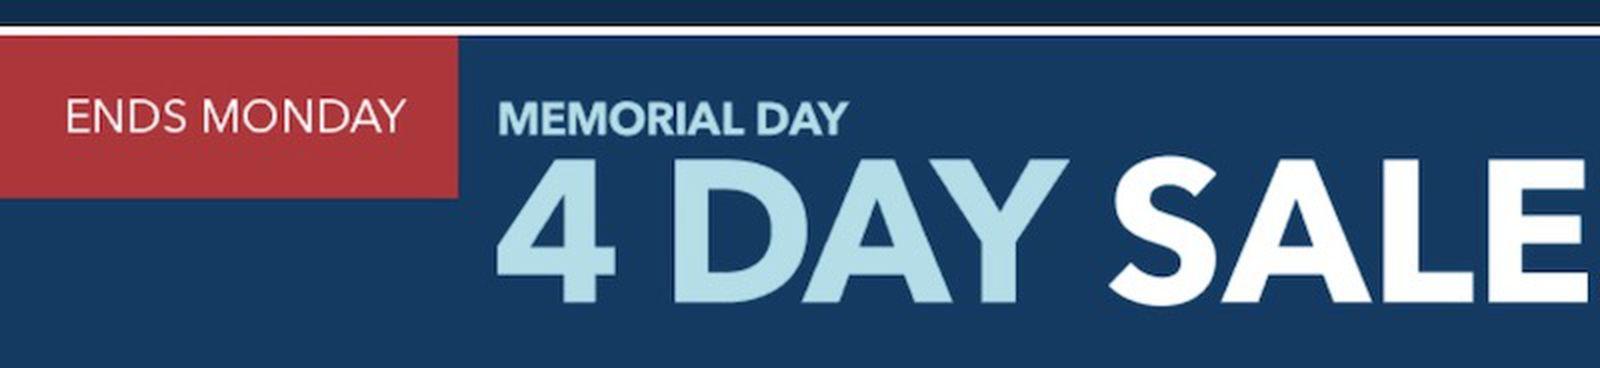 Best Buy Memorial Day Sale Savings On Apple Watch Mac Notebooks 9 7 Inch Ipad Pro And More Macrumors